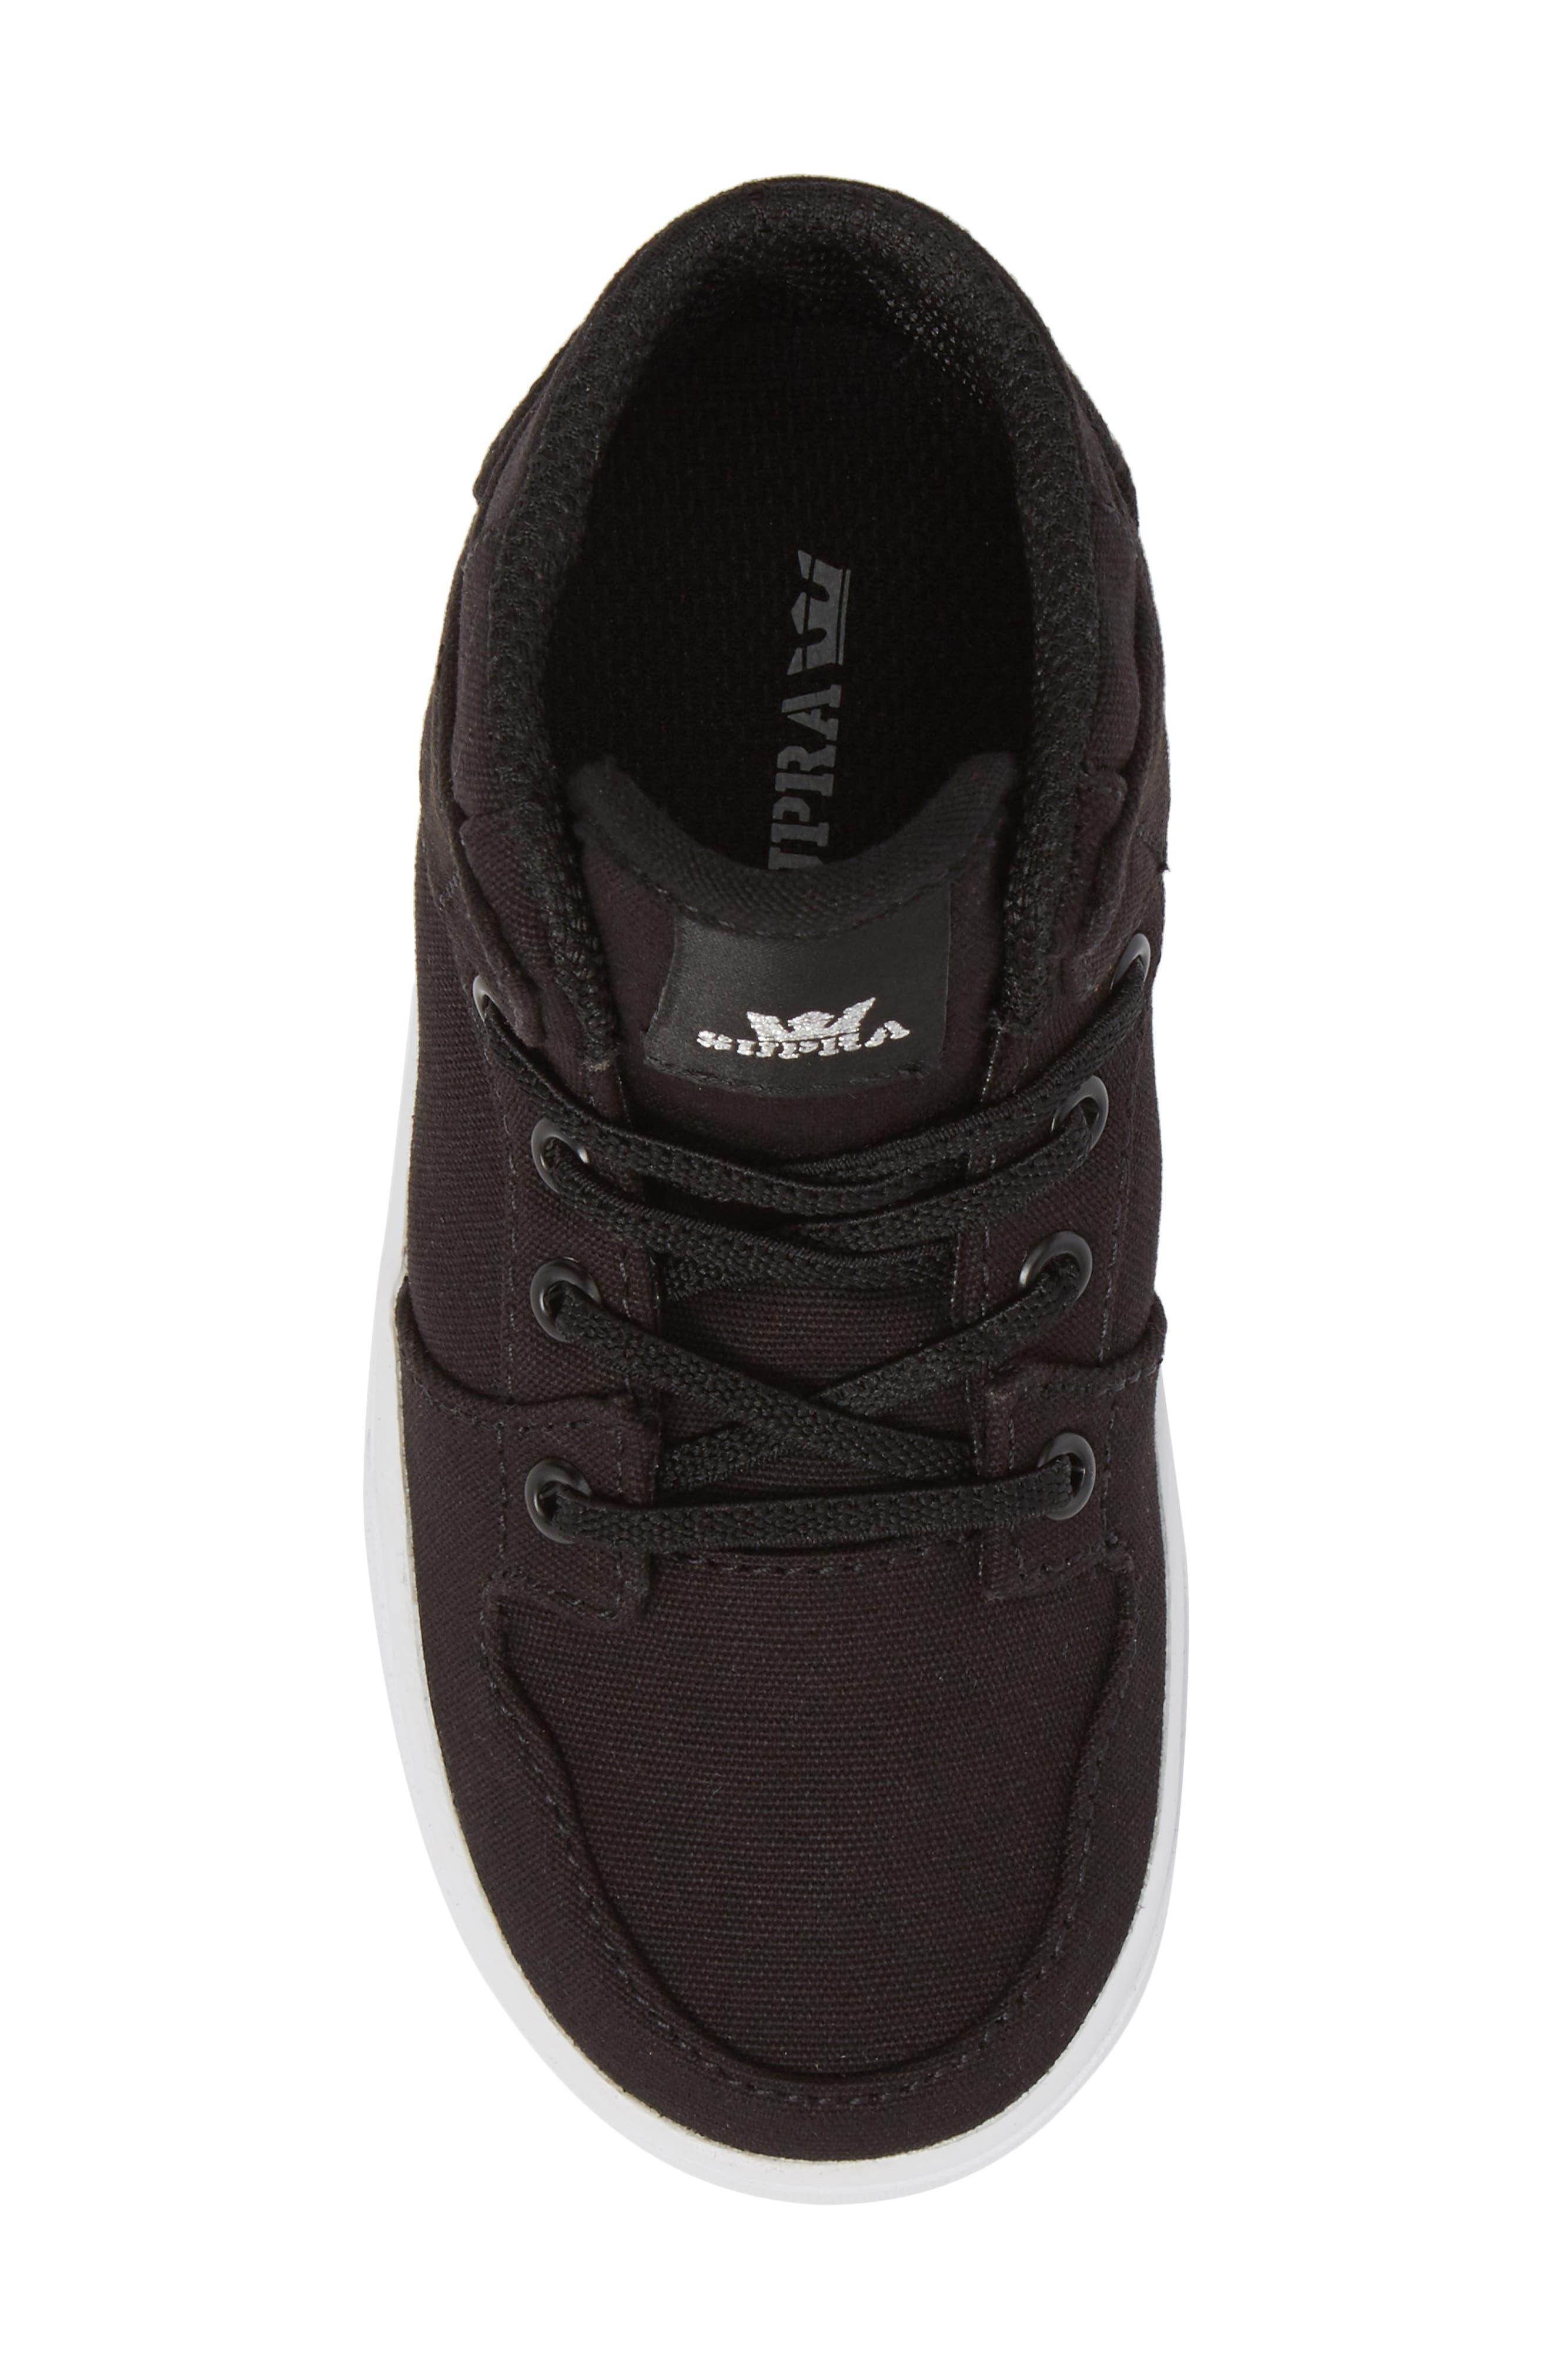 'Vaider' High Top Sneaker,                             Alternate thumbnail 5, color,                             Black/ White